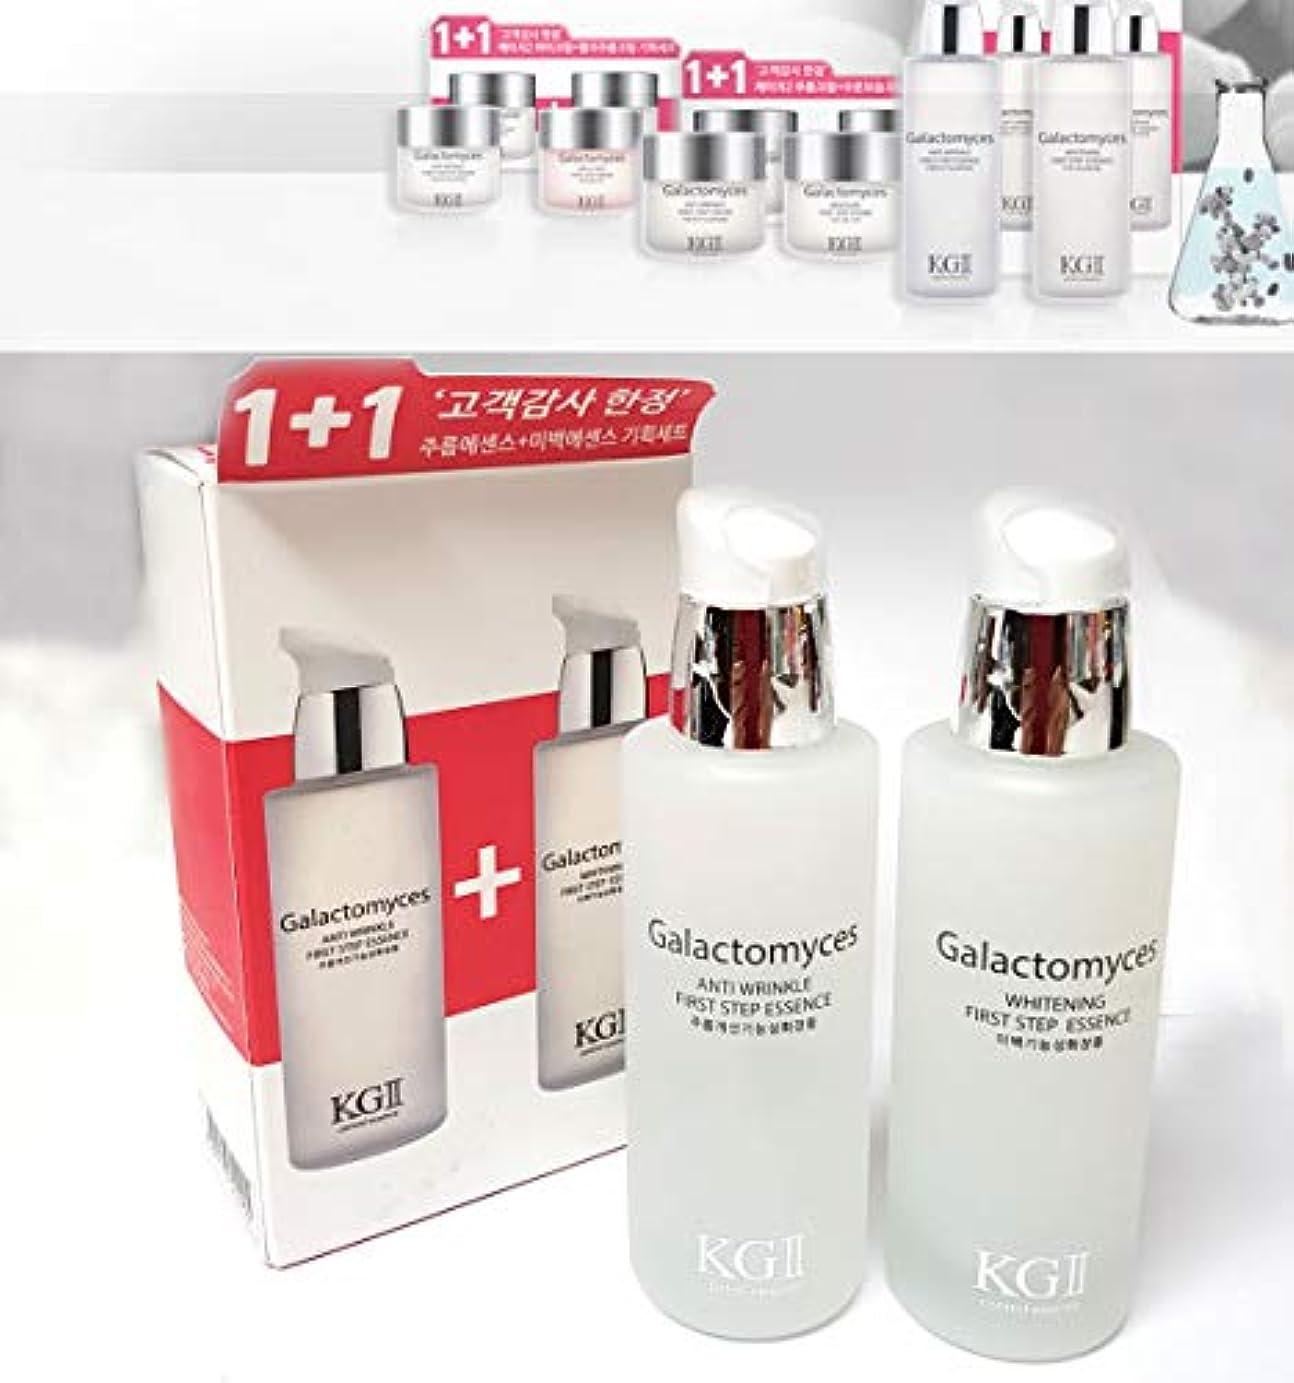 [KG2] ガラクトミセスファーストステップリンクルエッセンス+ホワイトニングエッセンスセット(50ml + 50ml) / Galactomyces First Step Wrinkle Essence + Whitening...